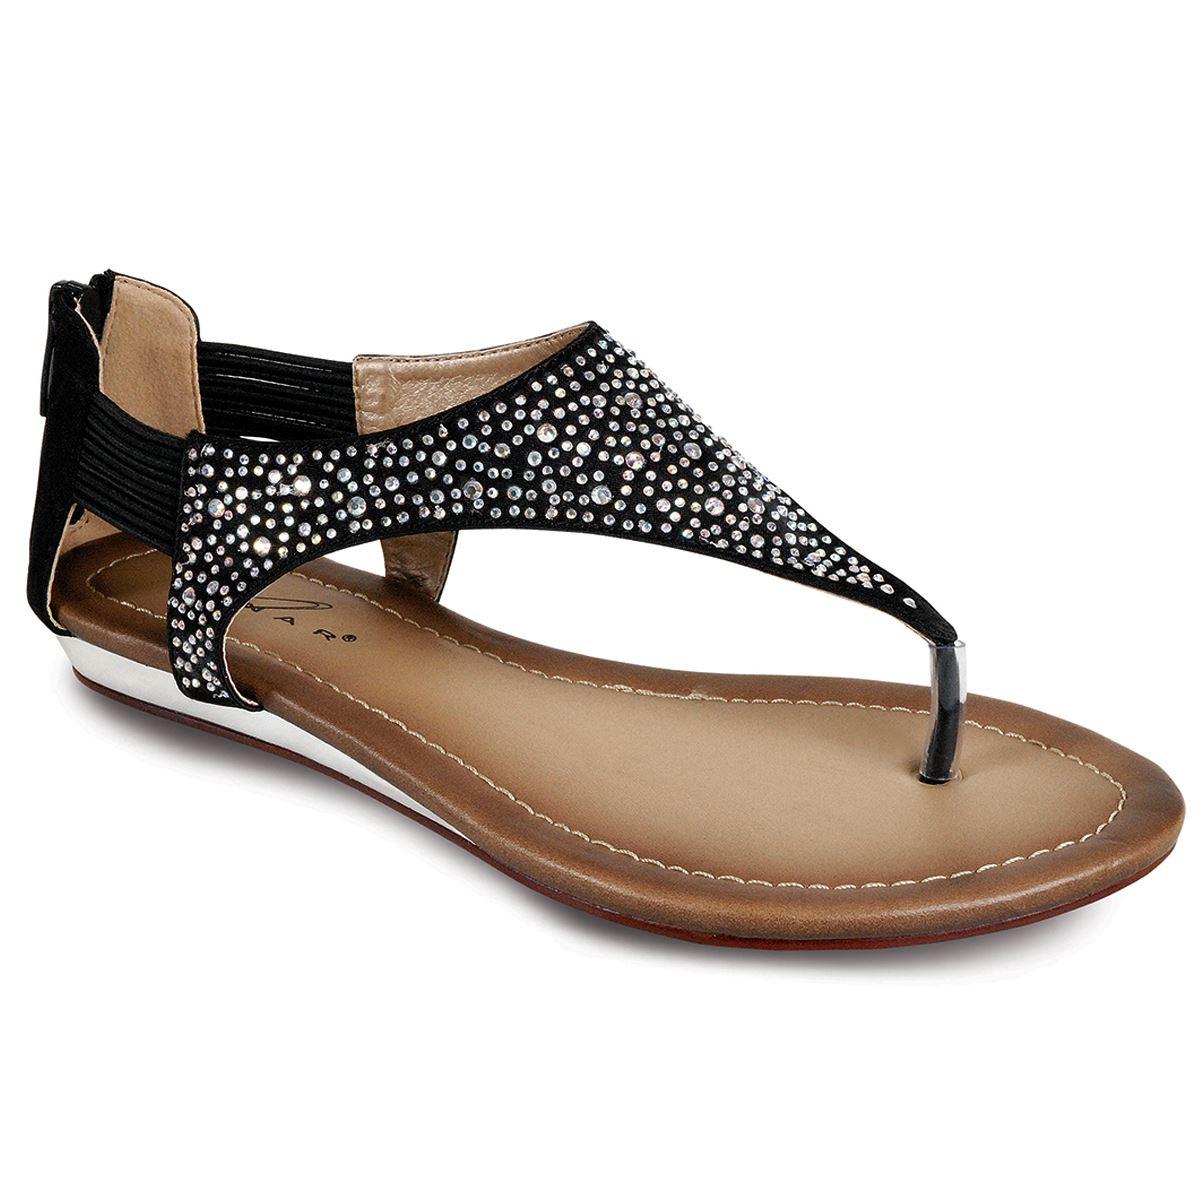 13b5a2876 Ladies Diamante Front Low Heel Zip Back Gladiator Fashion Thong Sandals  Shoes